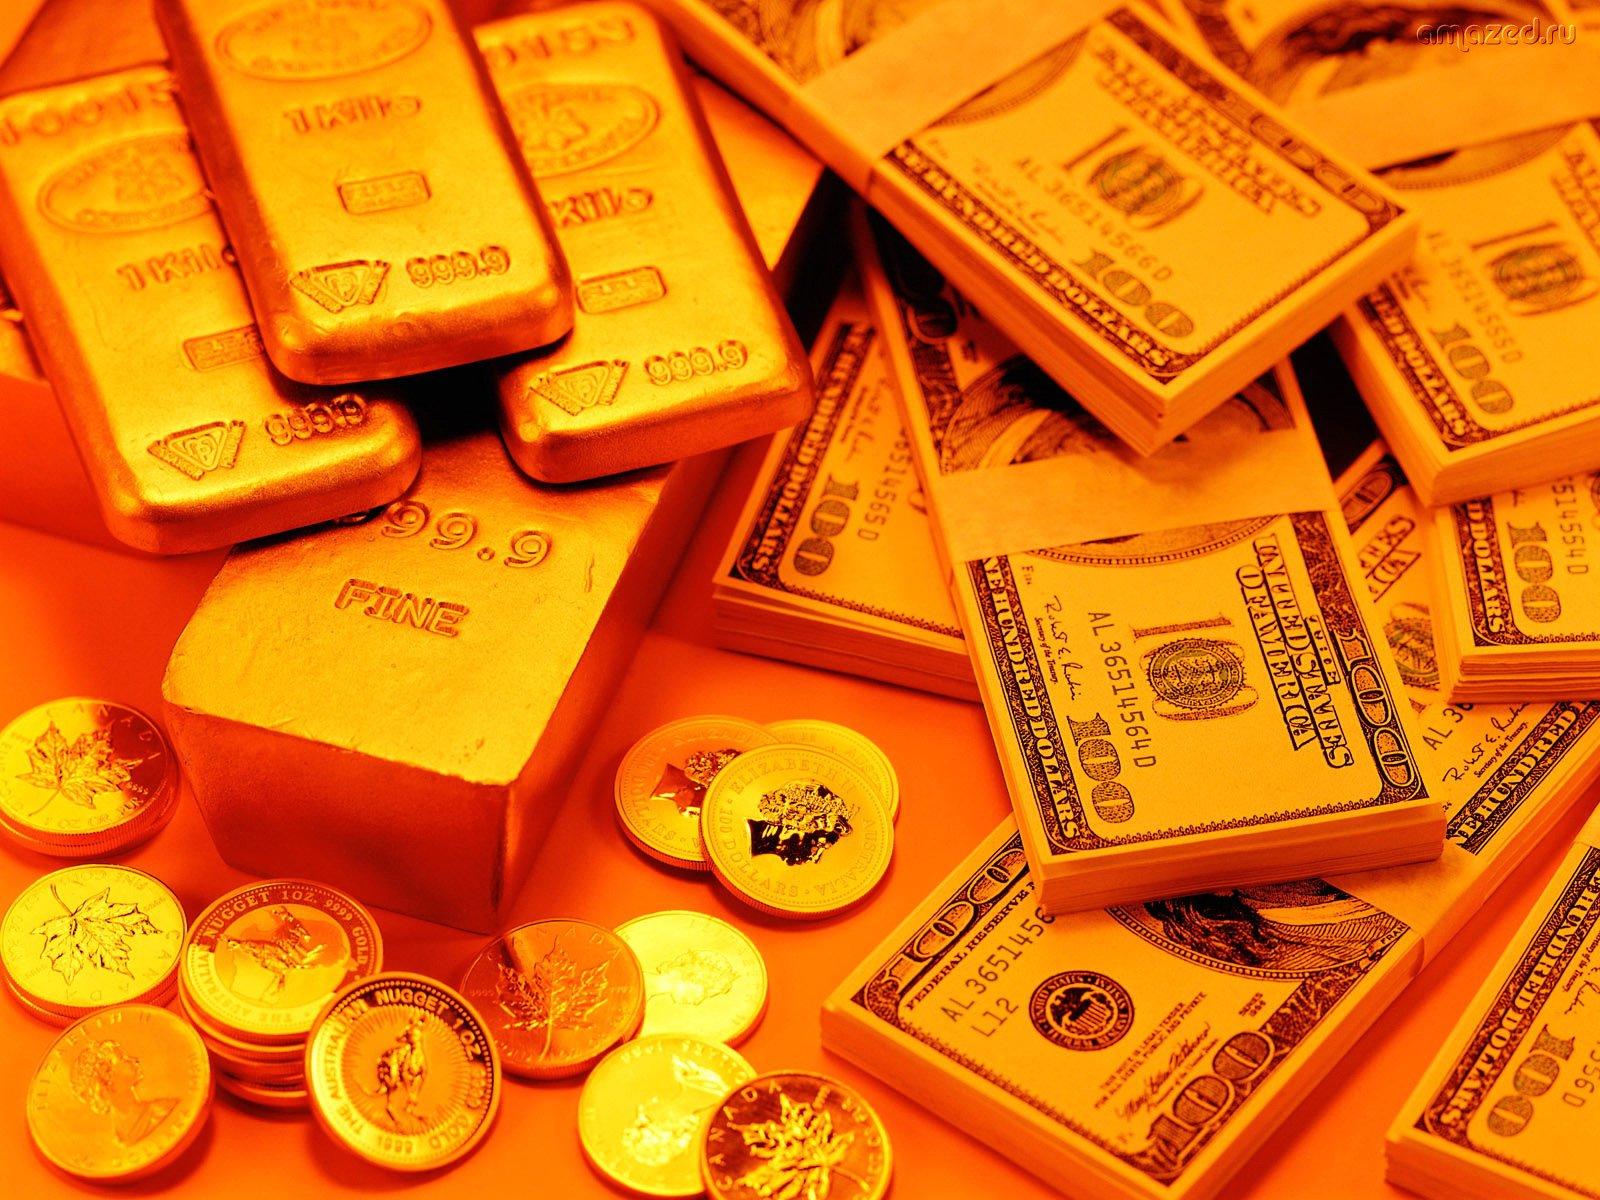 Картинка Доллары и золото - Картинки Деньги - Бесплатные ...: http://pictar.ru/img-dollary-i-zoloto-43240.htm